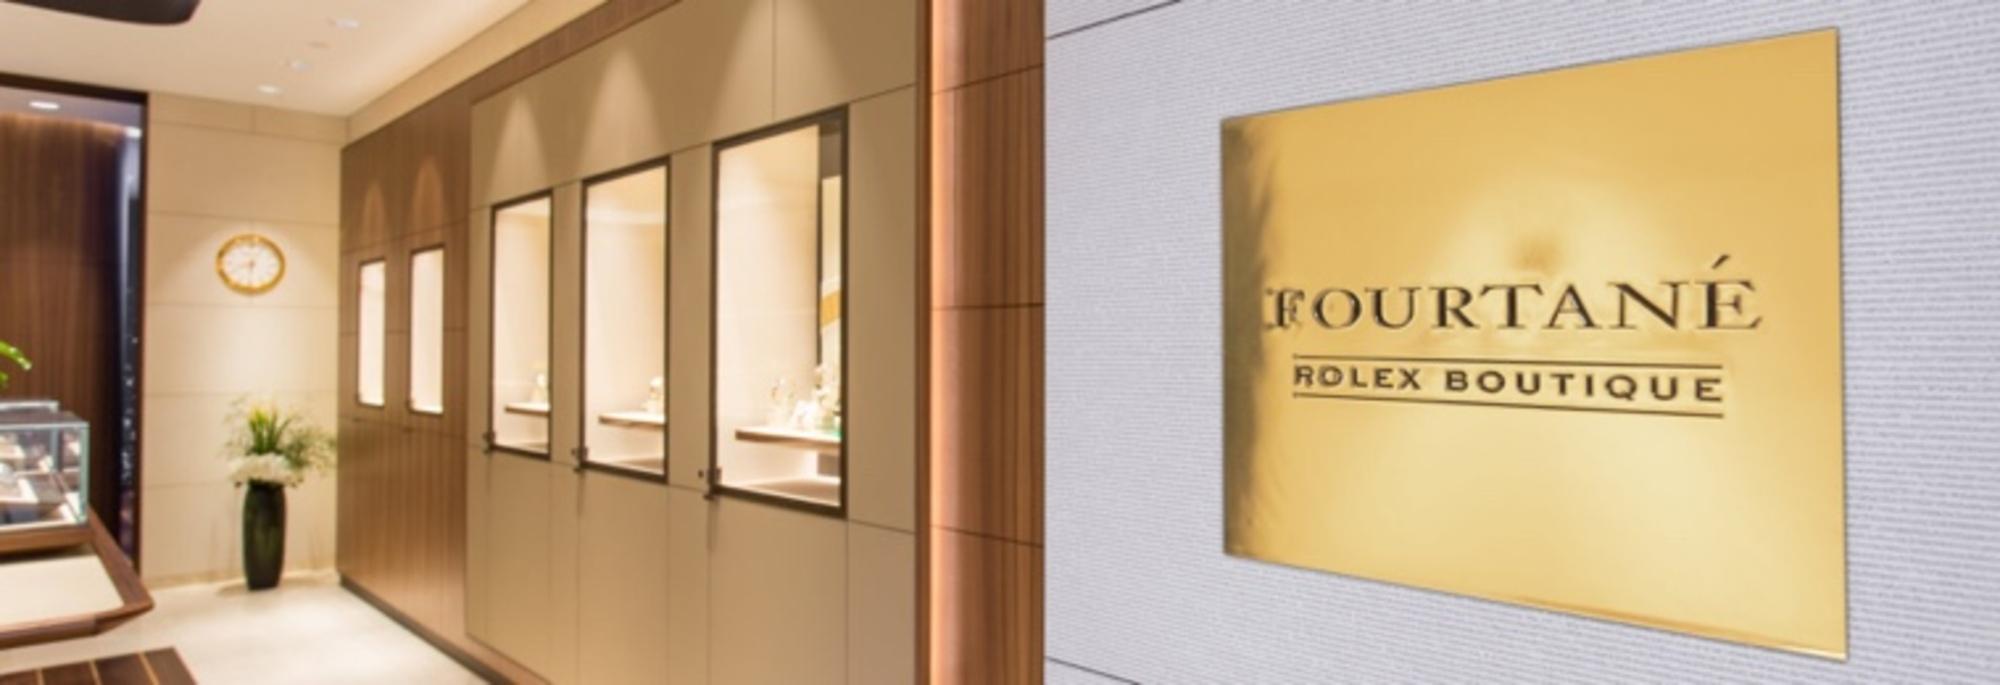 Fourtane Rolex Boutique